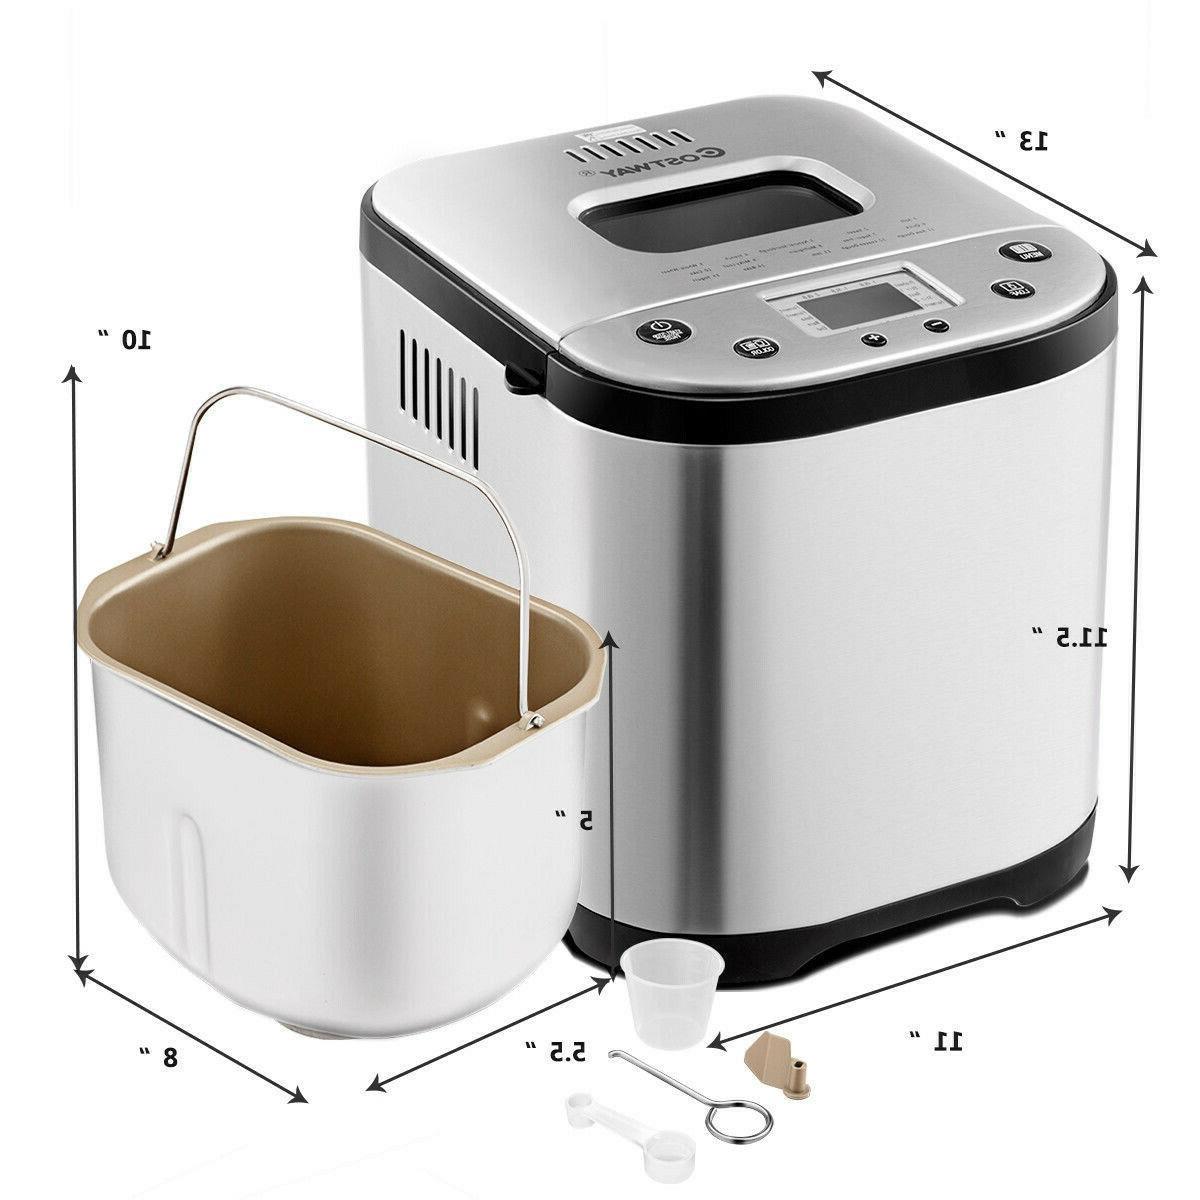 Maquina automatica para hacer pan de inoxidable Maquina